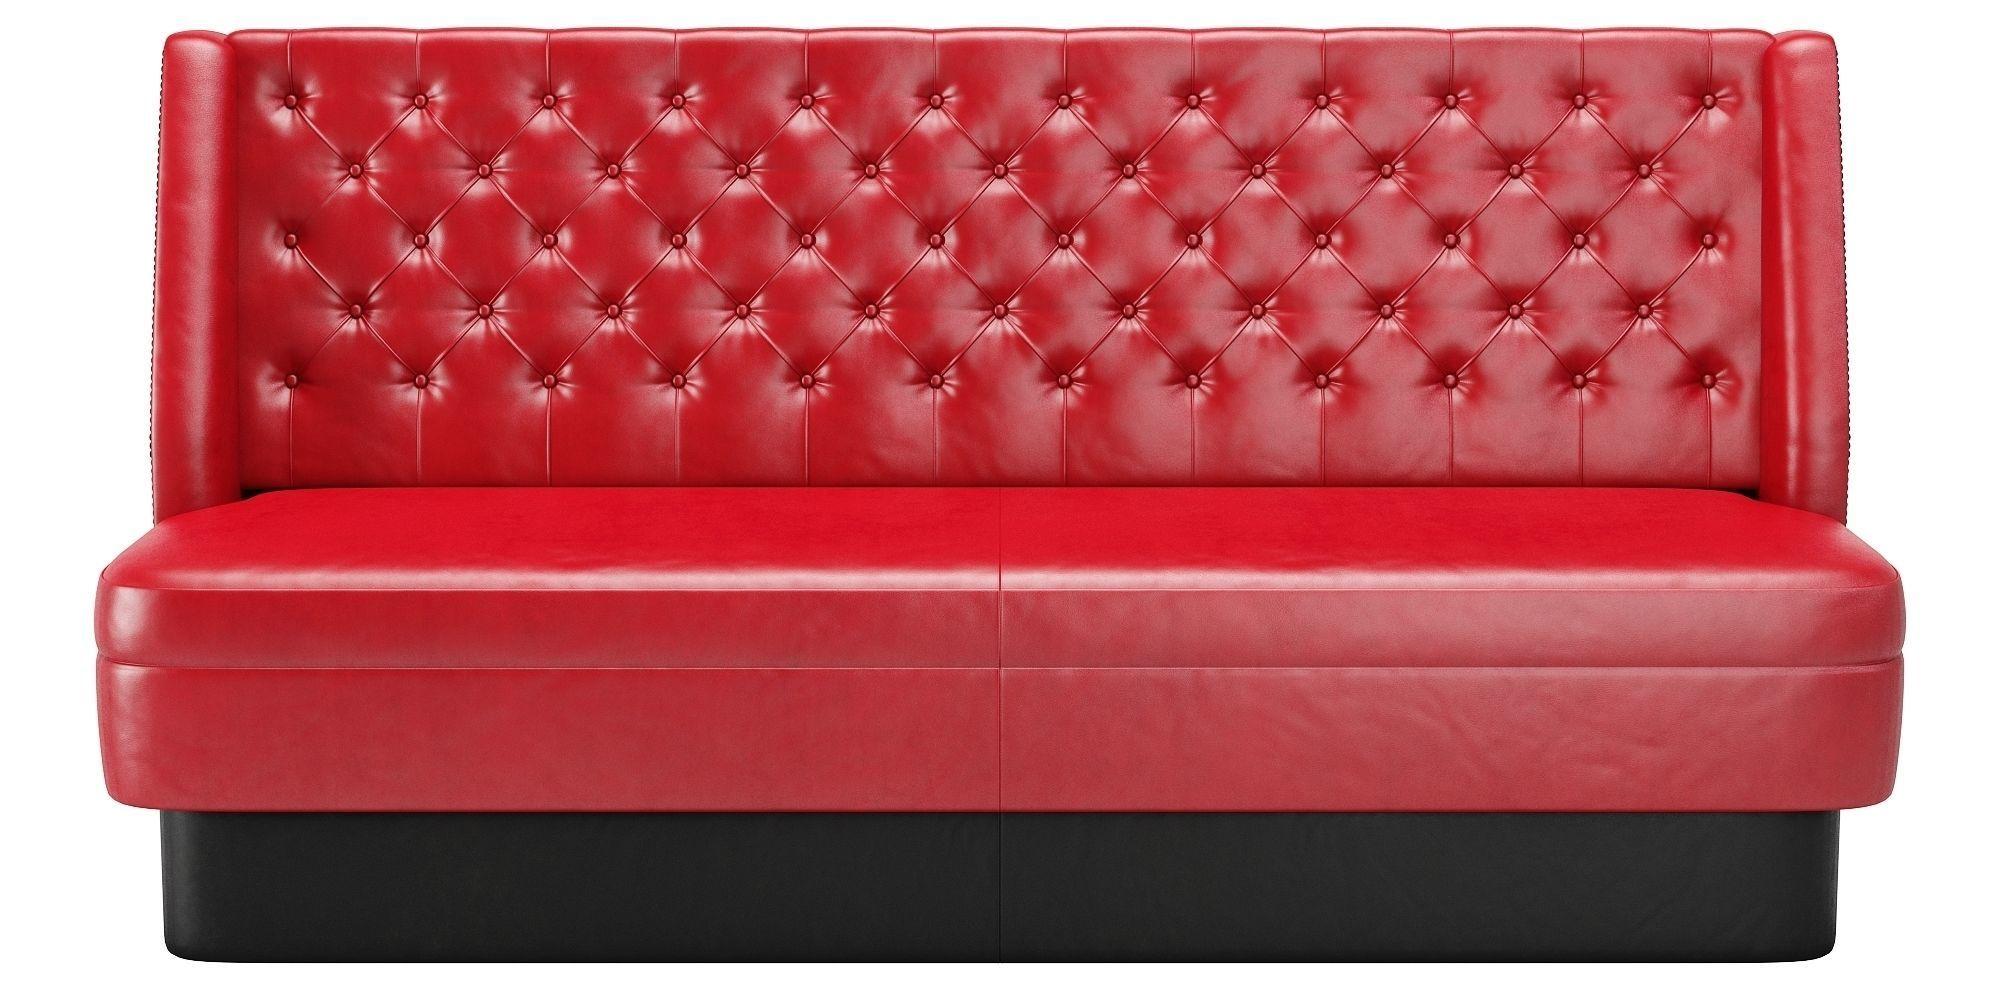 Toposworkshop Jazz Sofa 3d Model Max Obj Mtl Fbx Unitypackage Prefab 1 ...